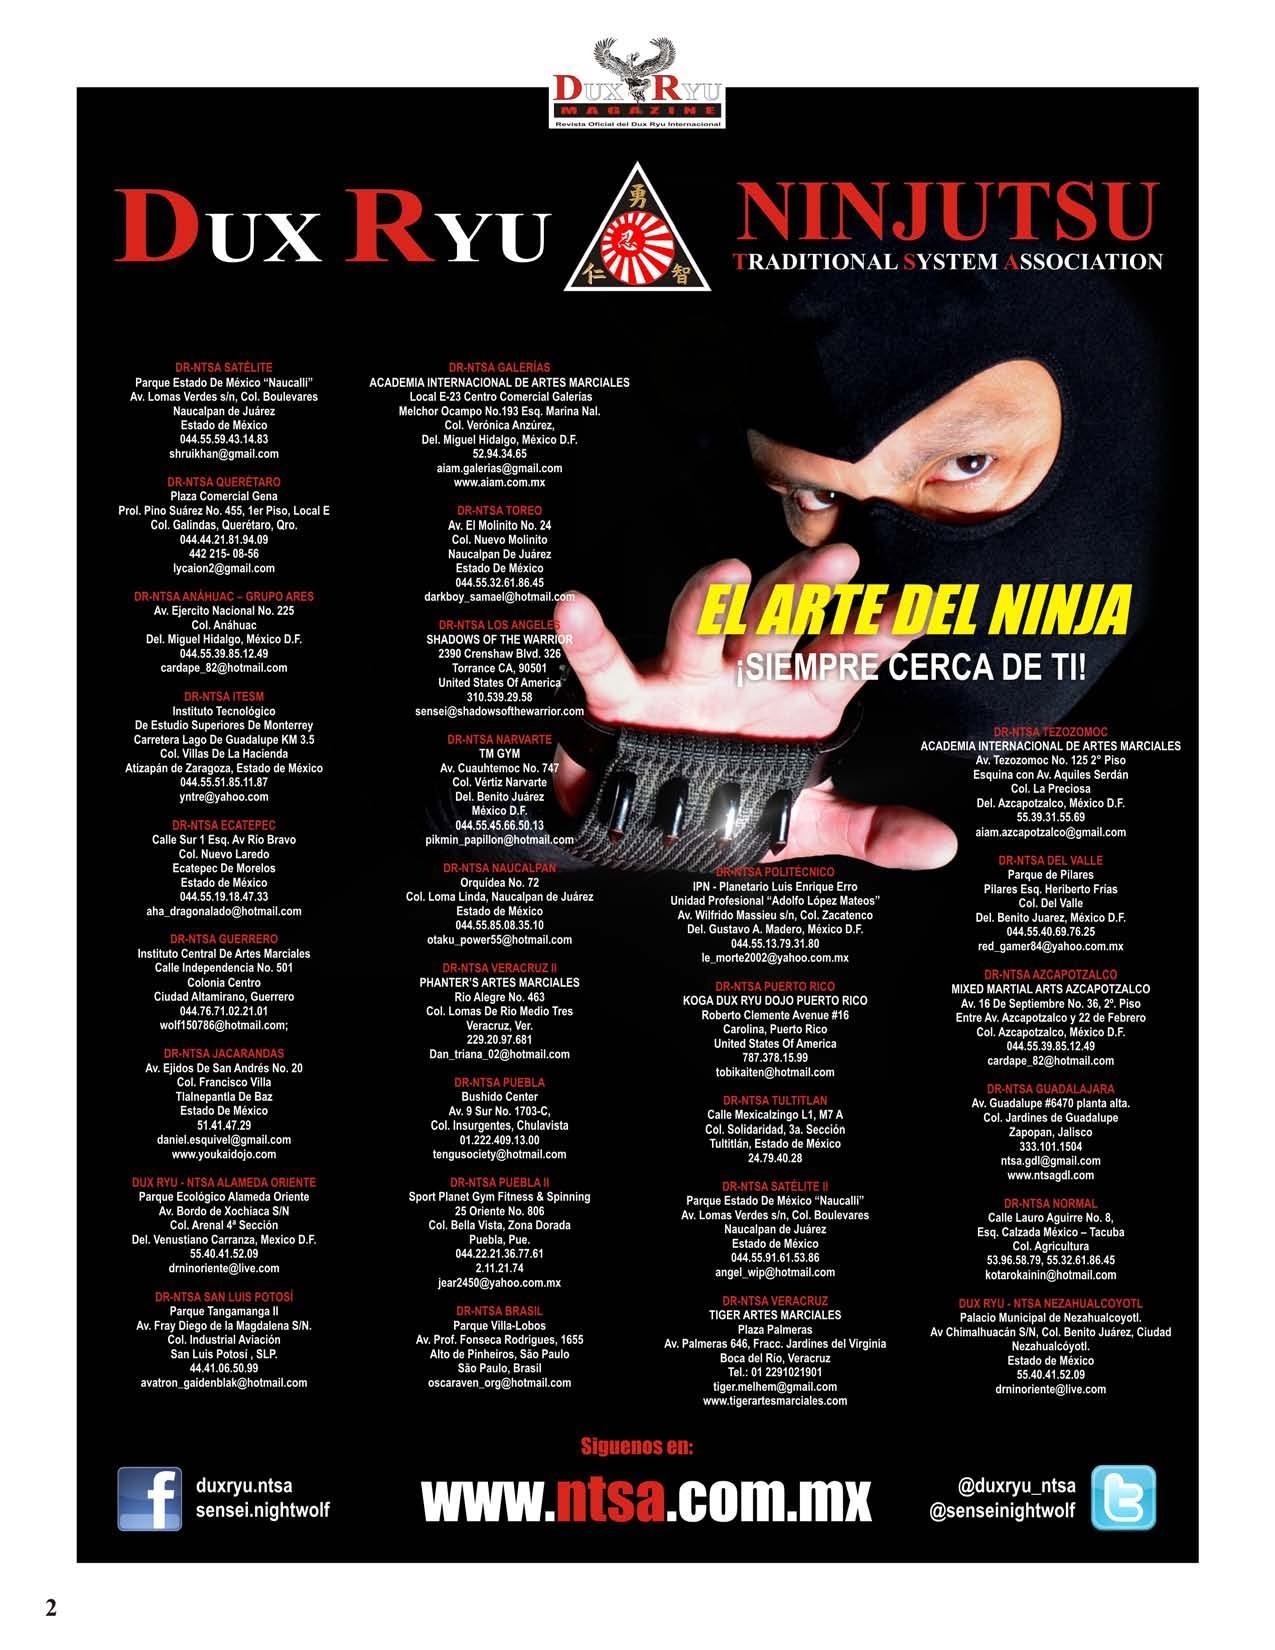 dux-ryu-magazine-4-page-004